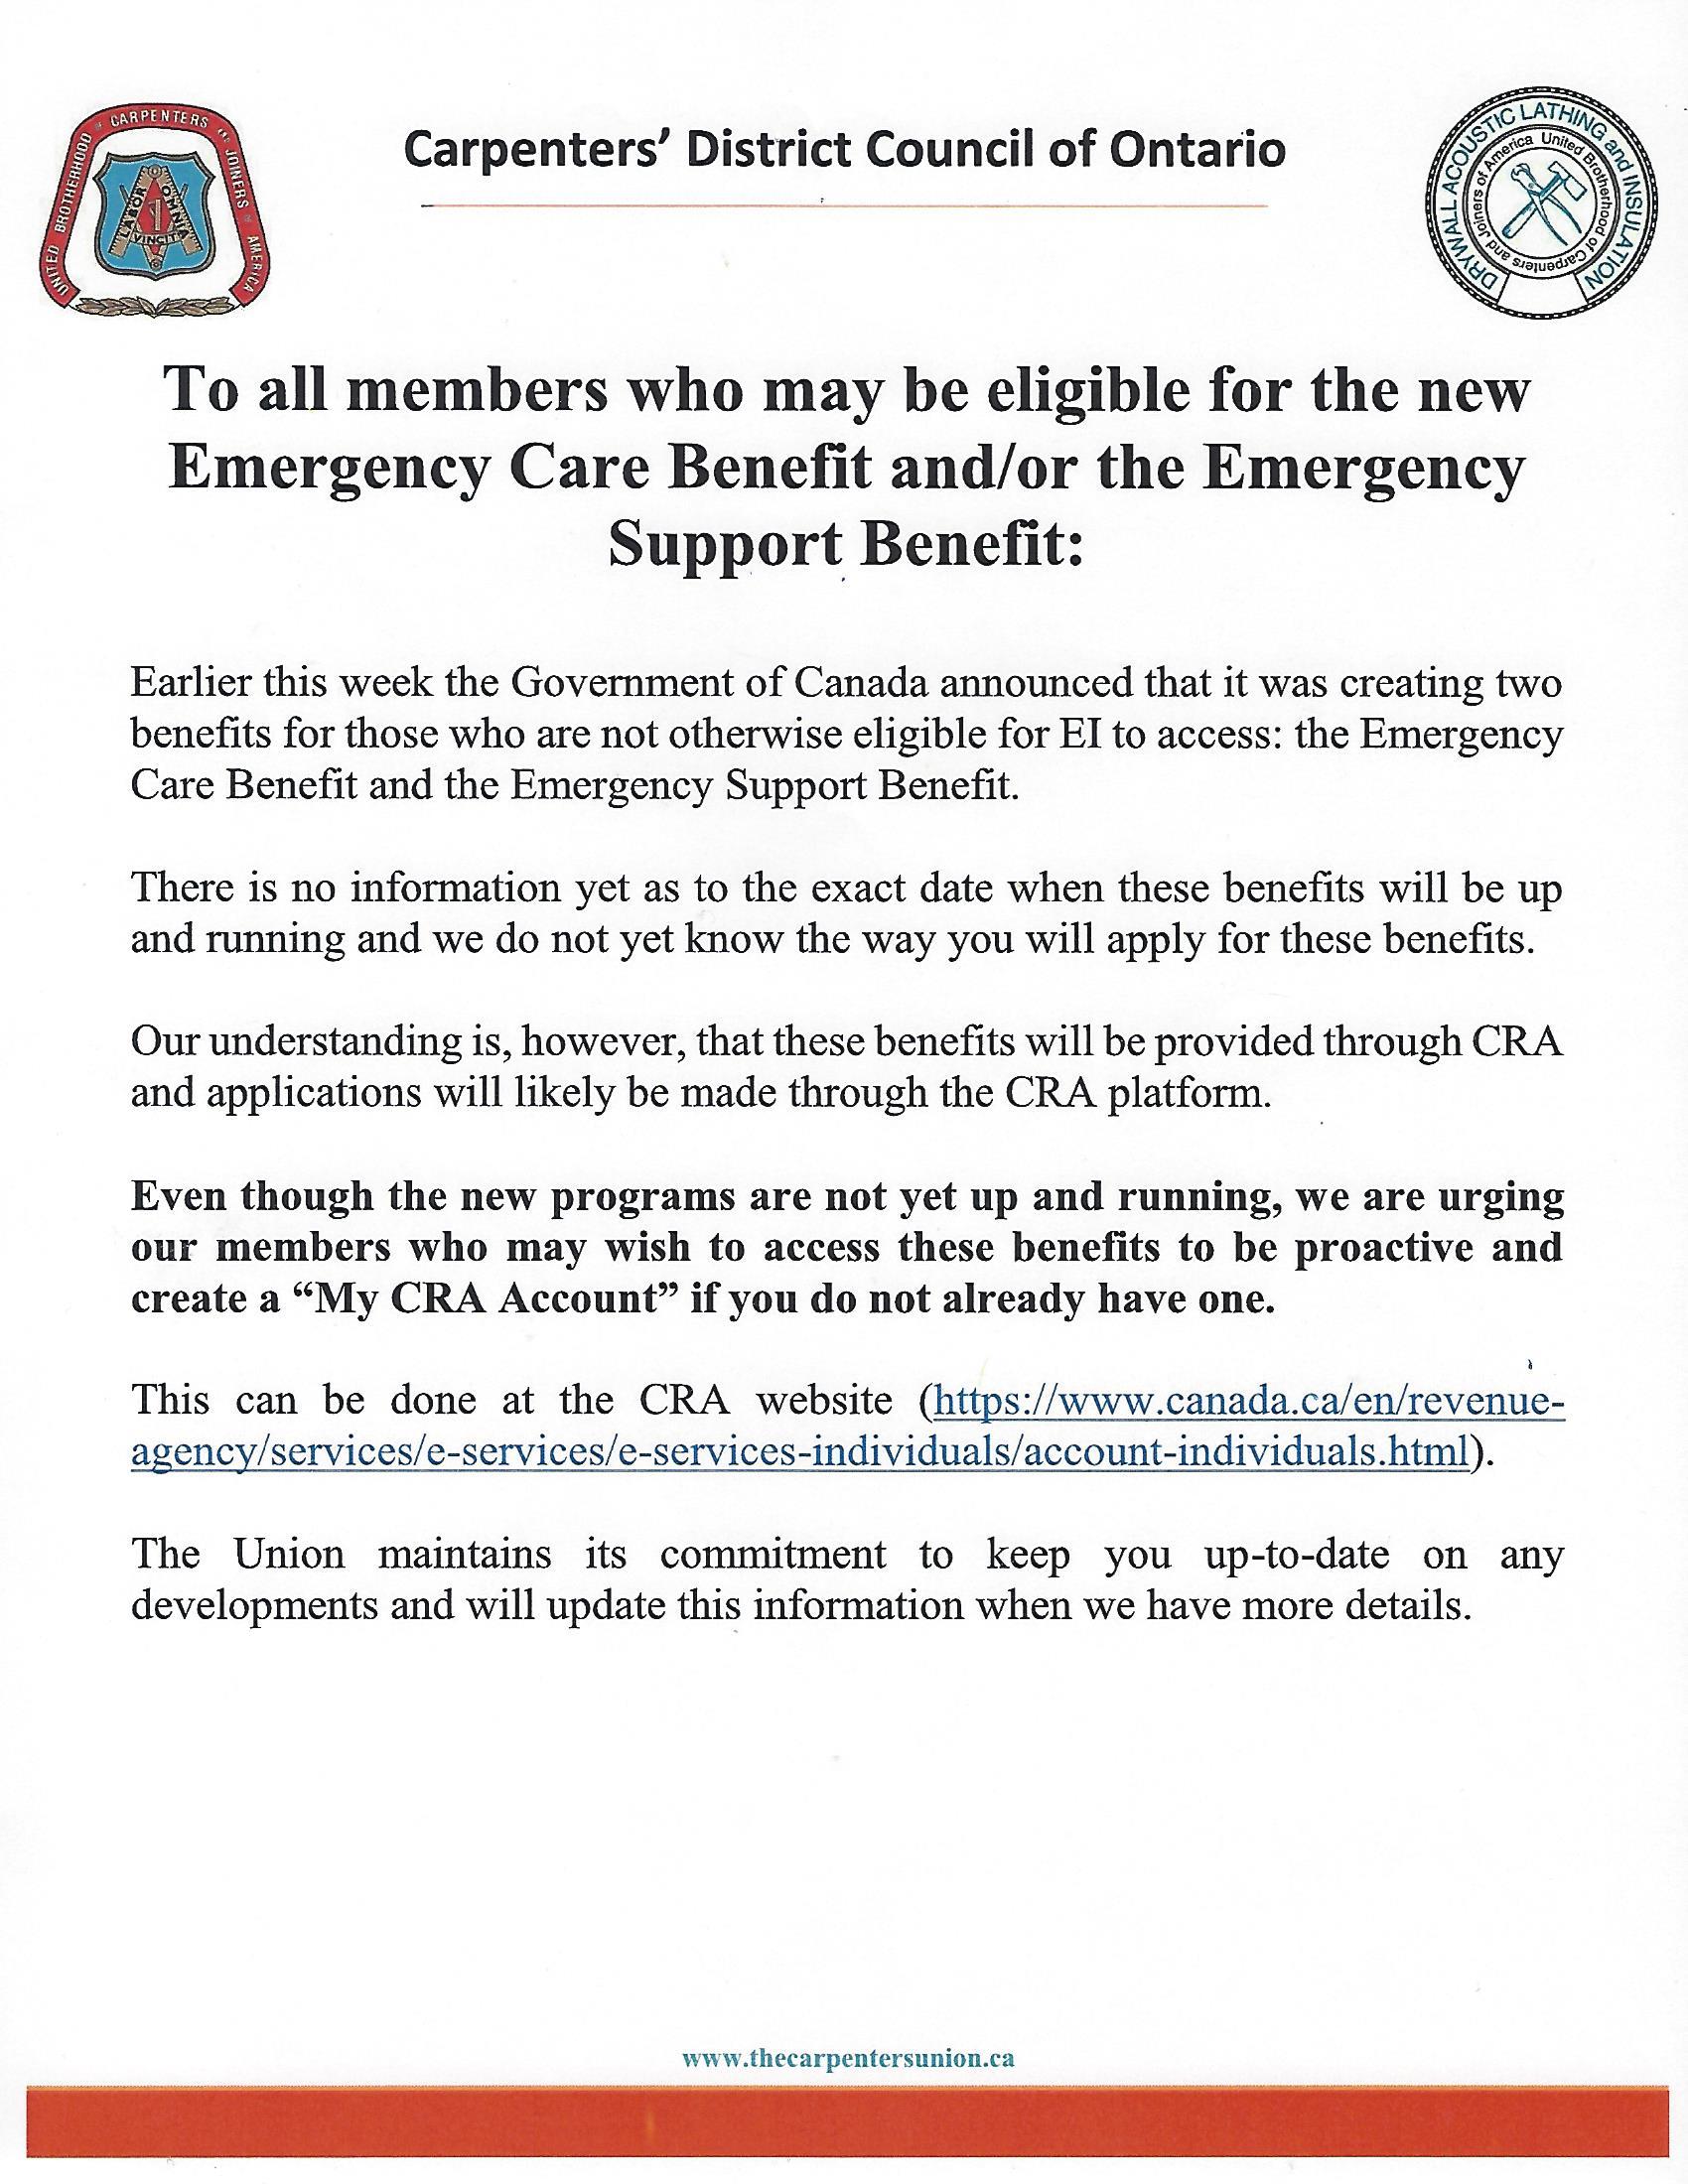 2020.03.20-COVID-19_Emergency_Care_Benefits.jpg